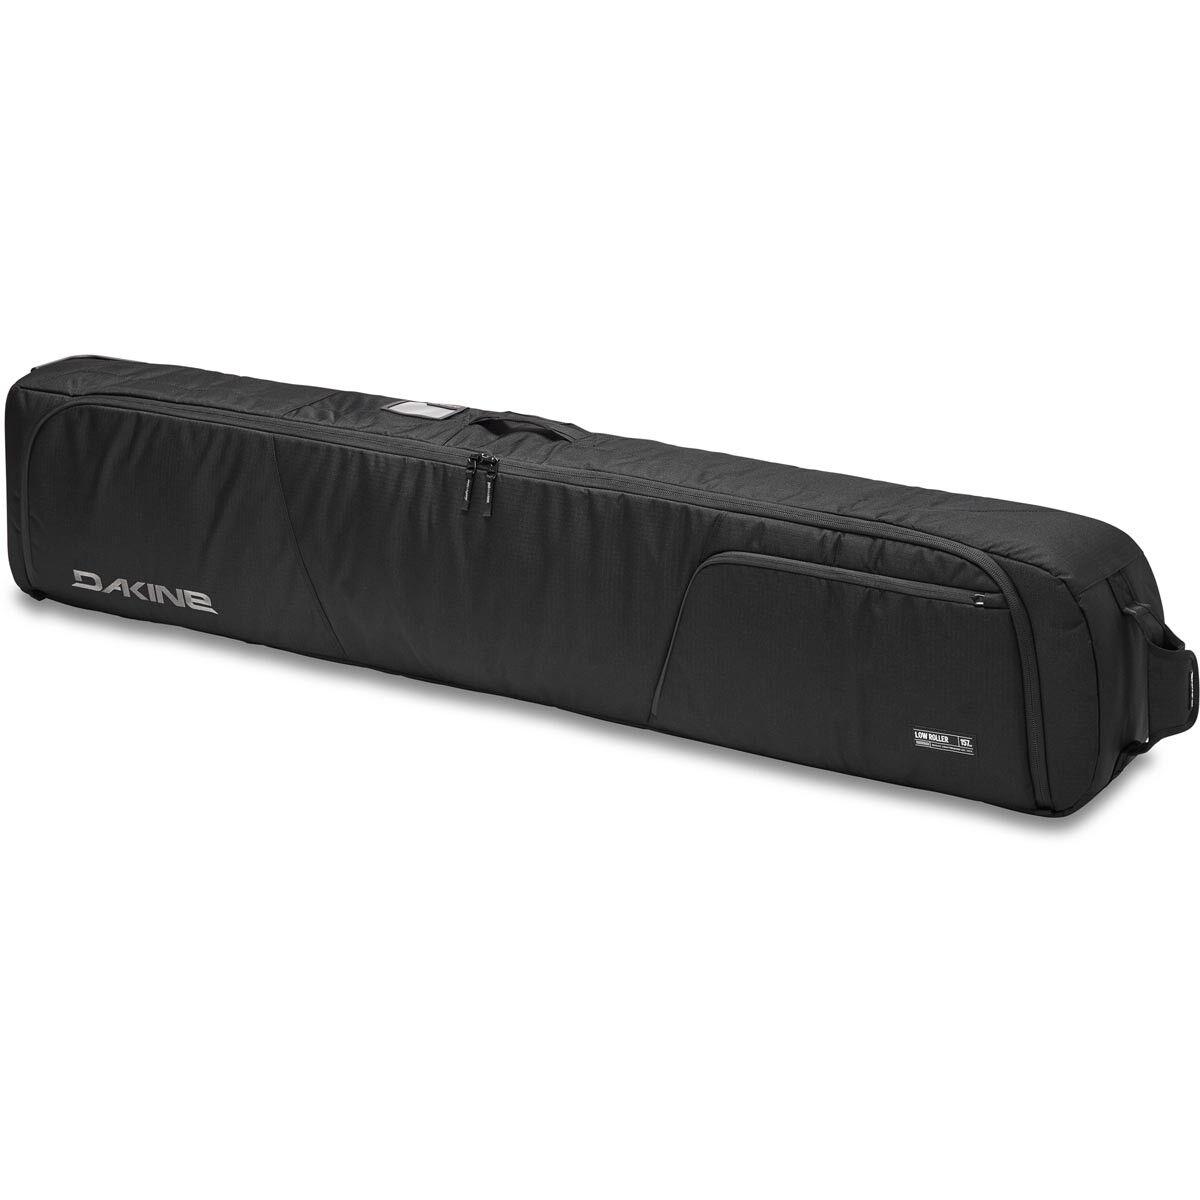 Dakine Low Roller Snowboard Bag 157 cm Snowboard Boardbag Black